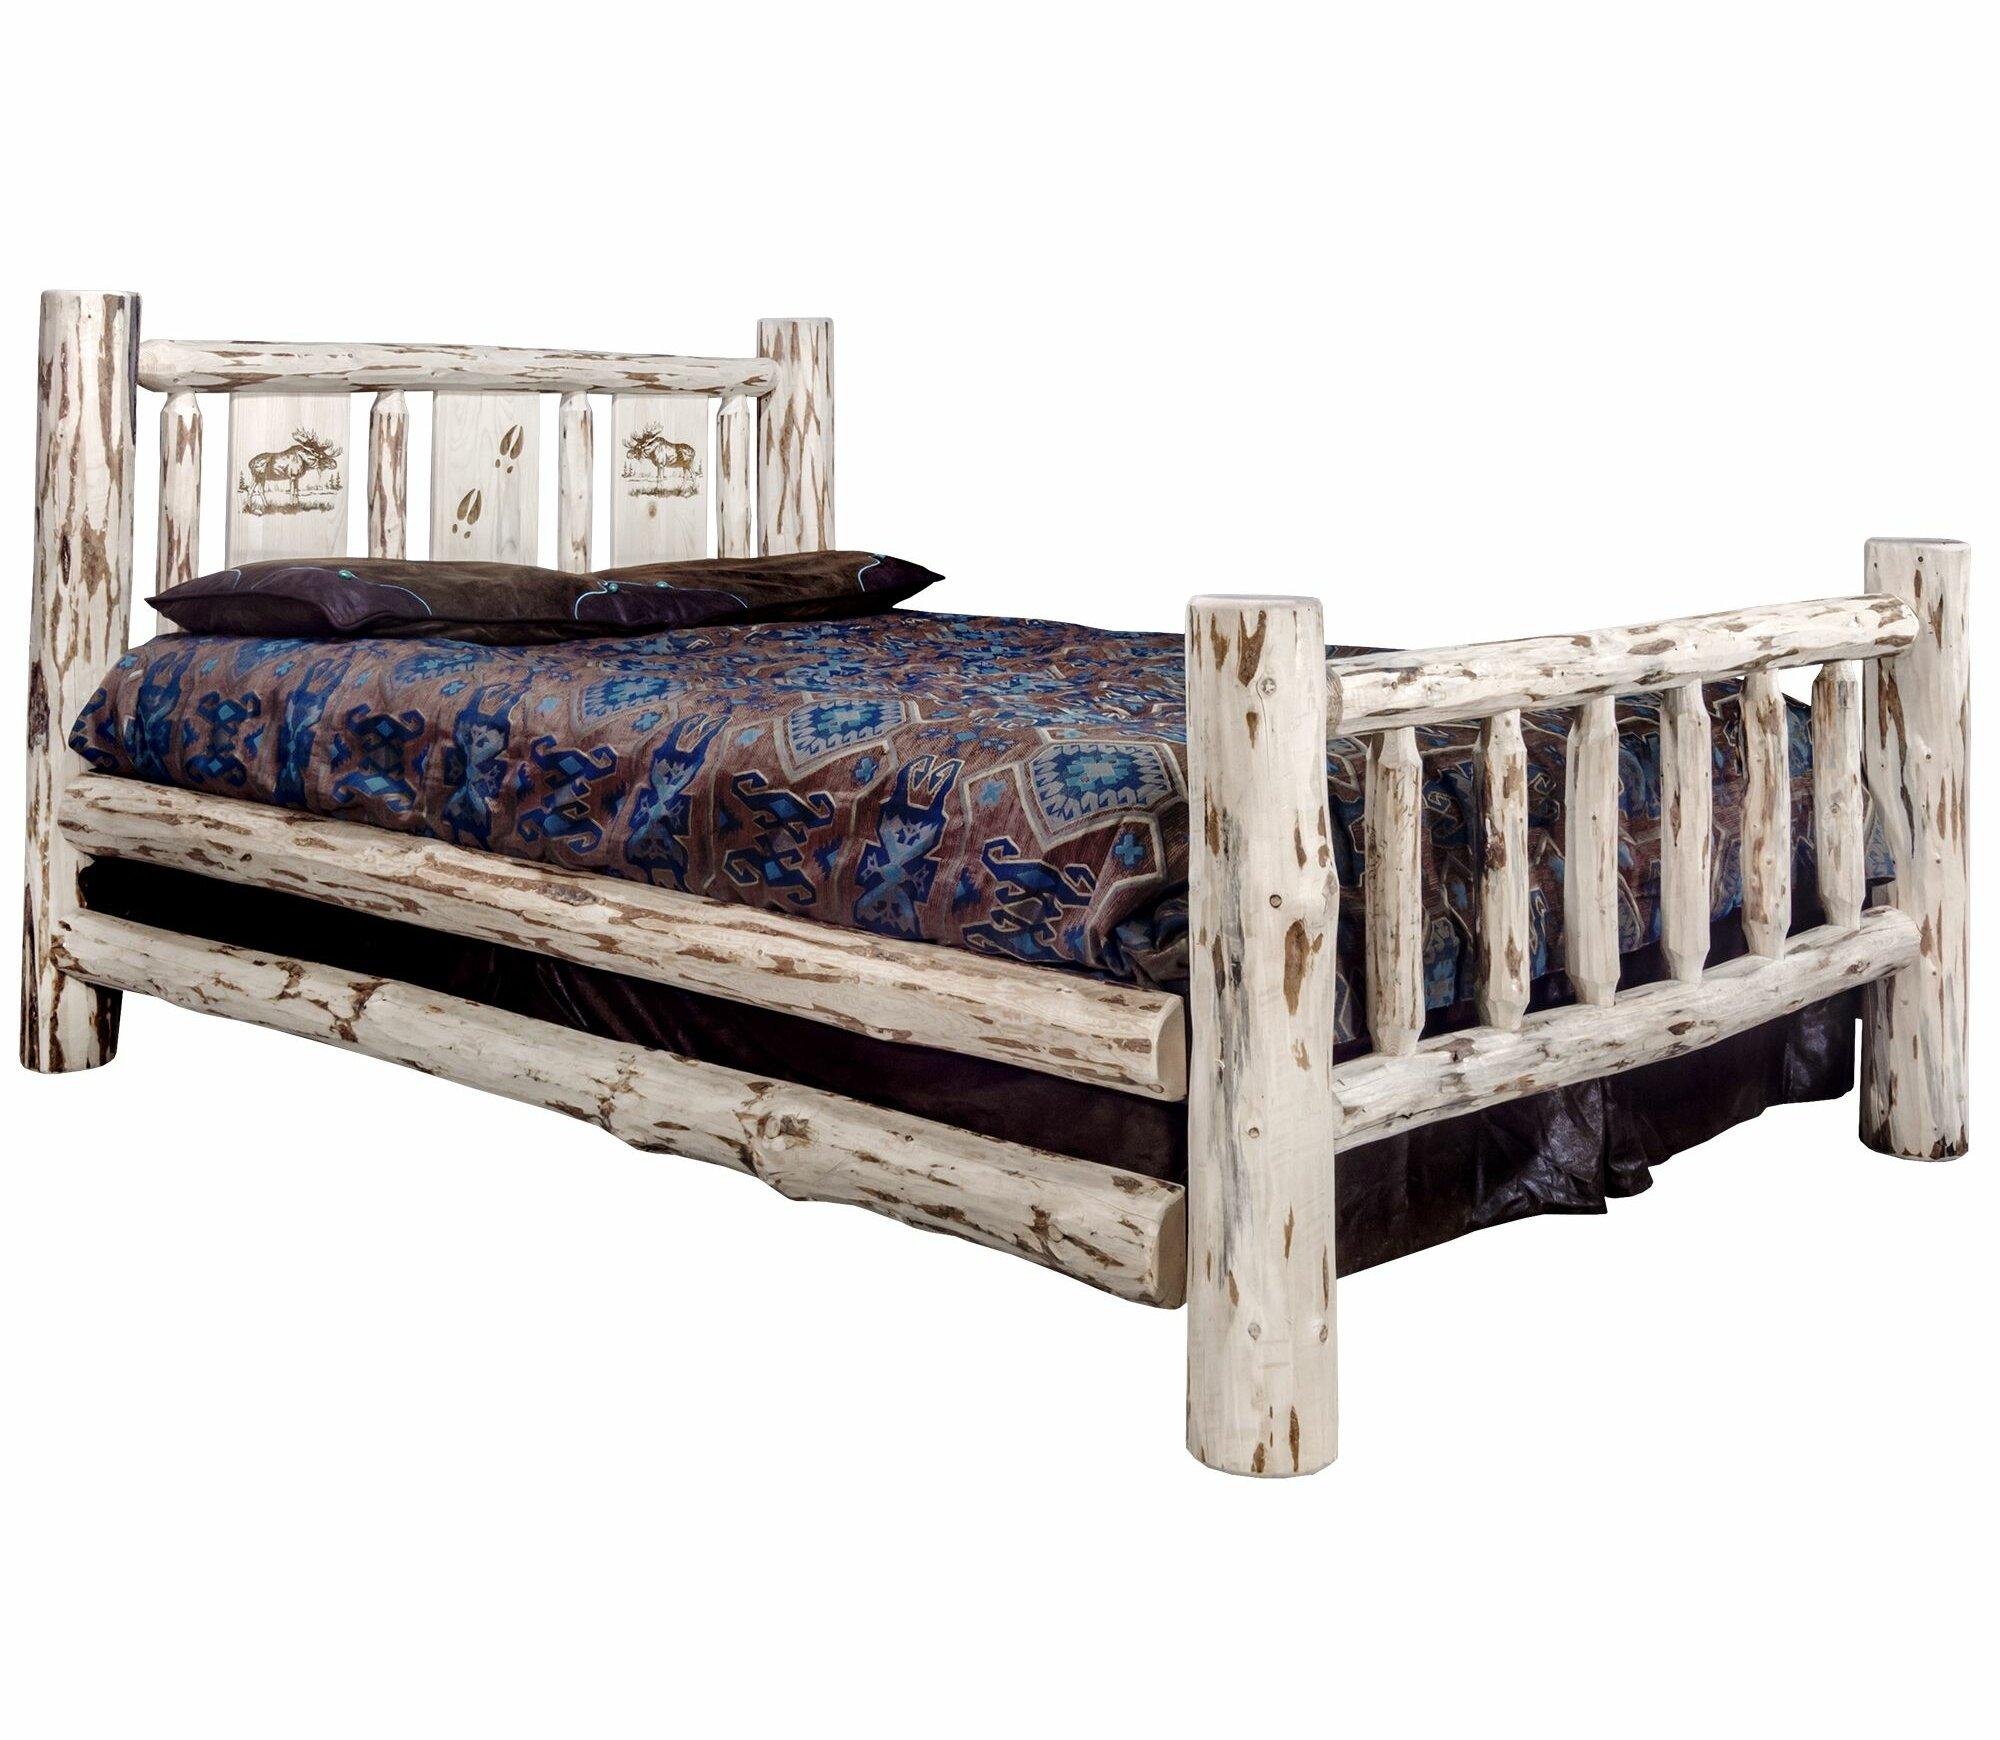 Millwood Pines Antigo Laser Engraved Moose Standard Bed Wayfair